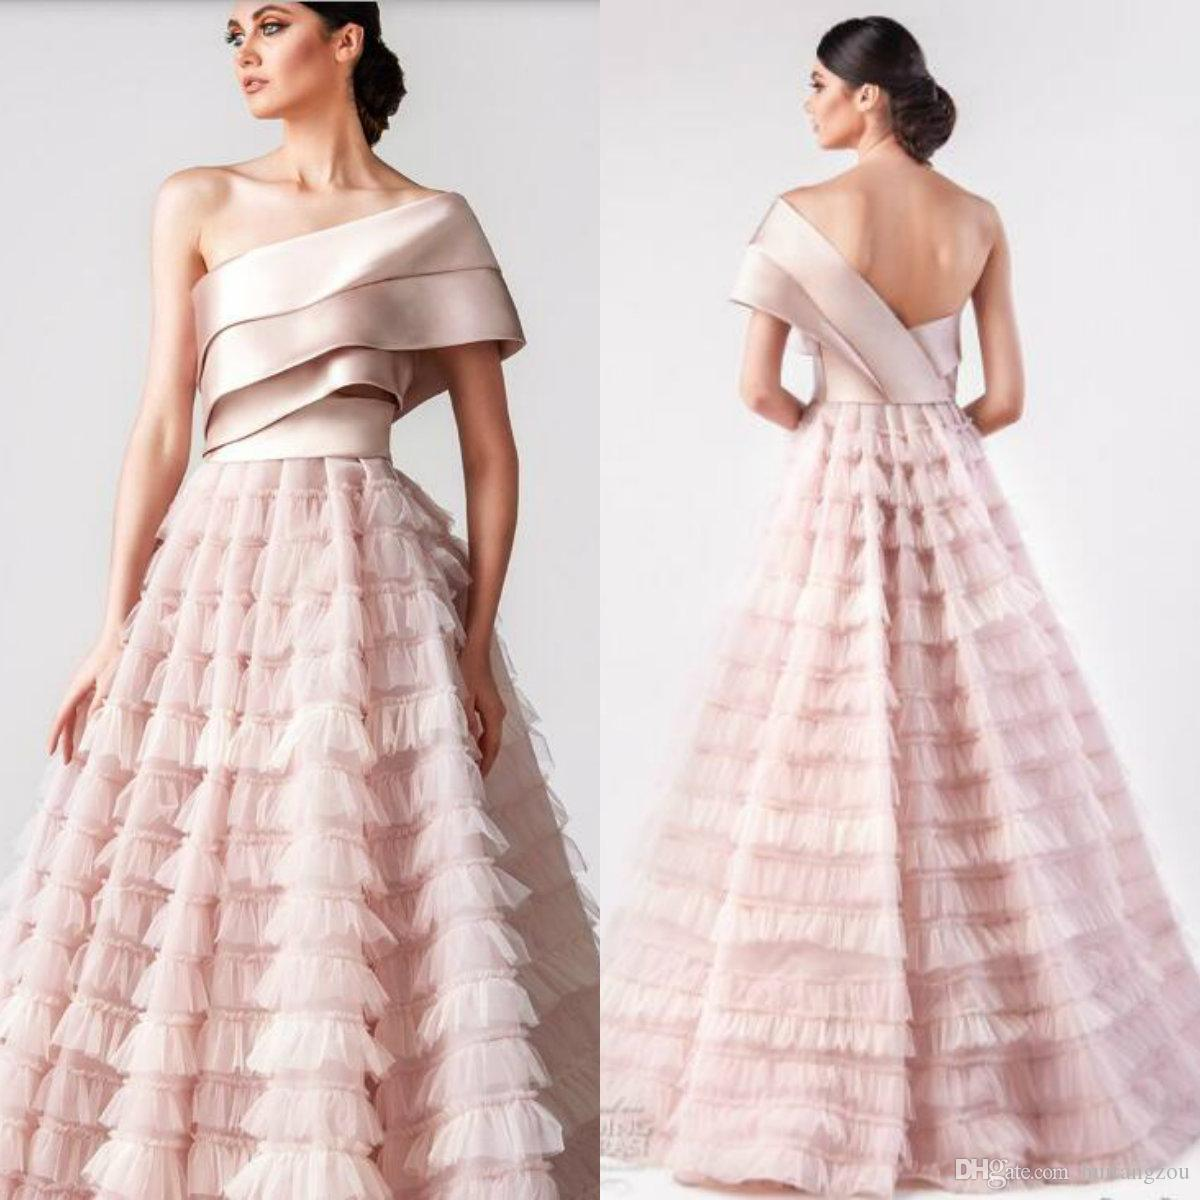 1738f669d64e One Shoulder Prom Dress Pattern